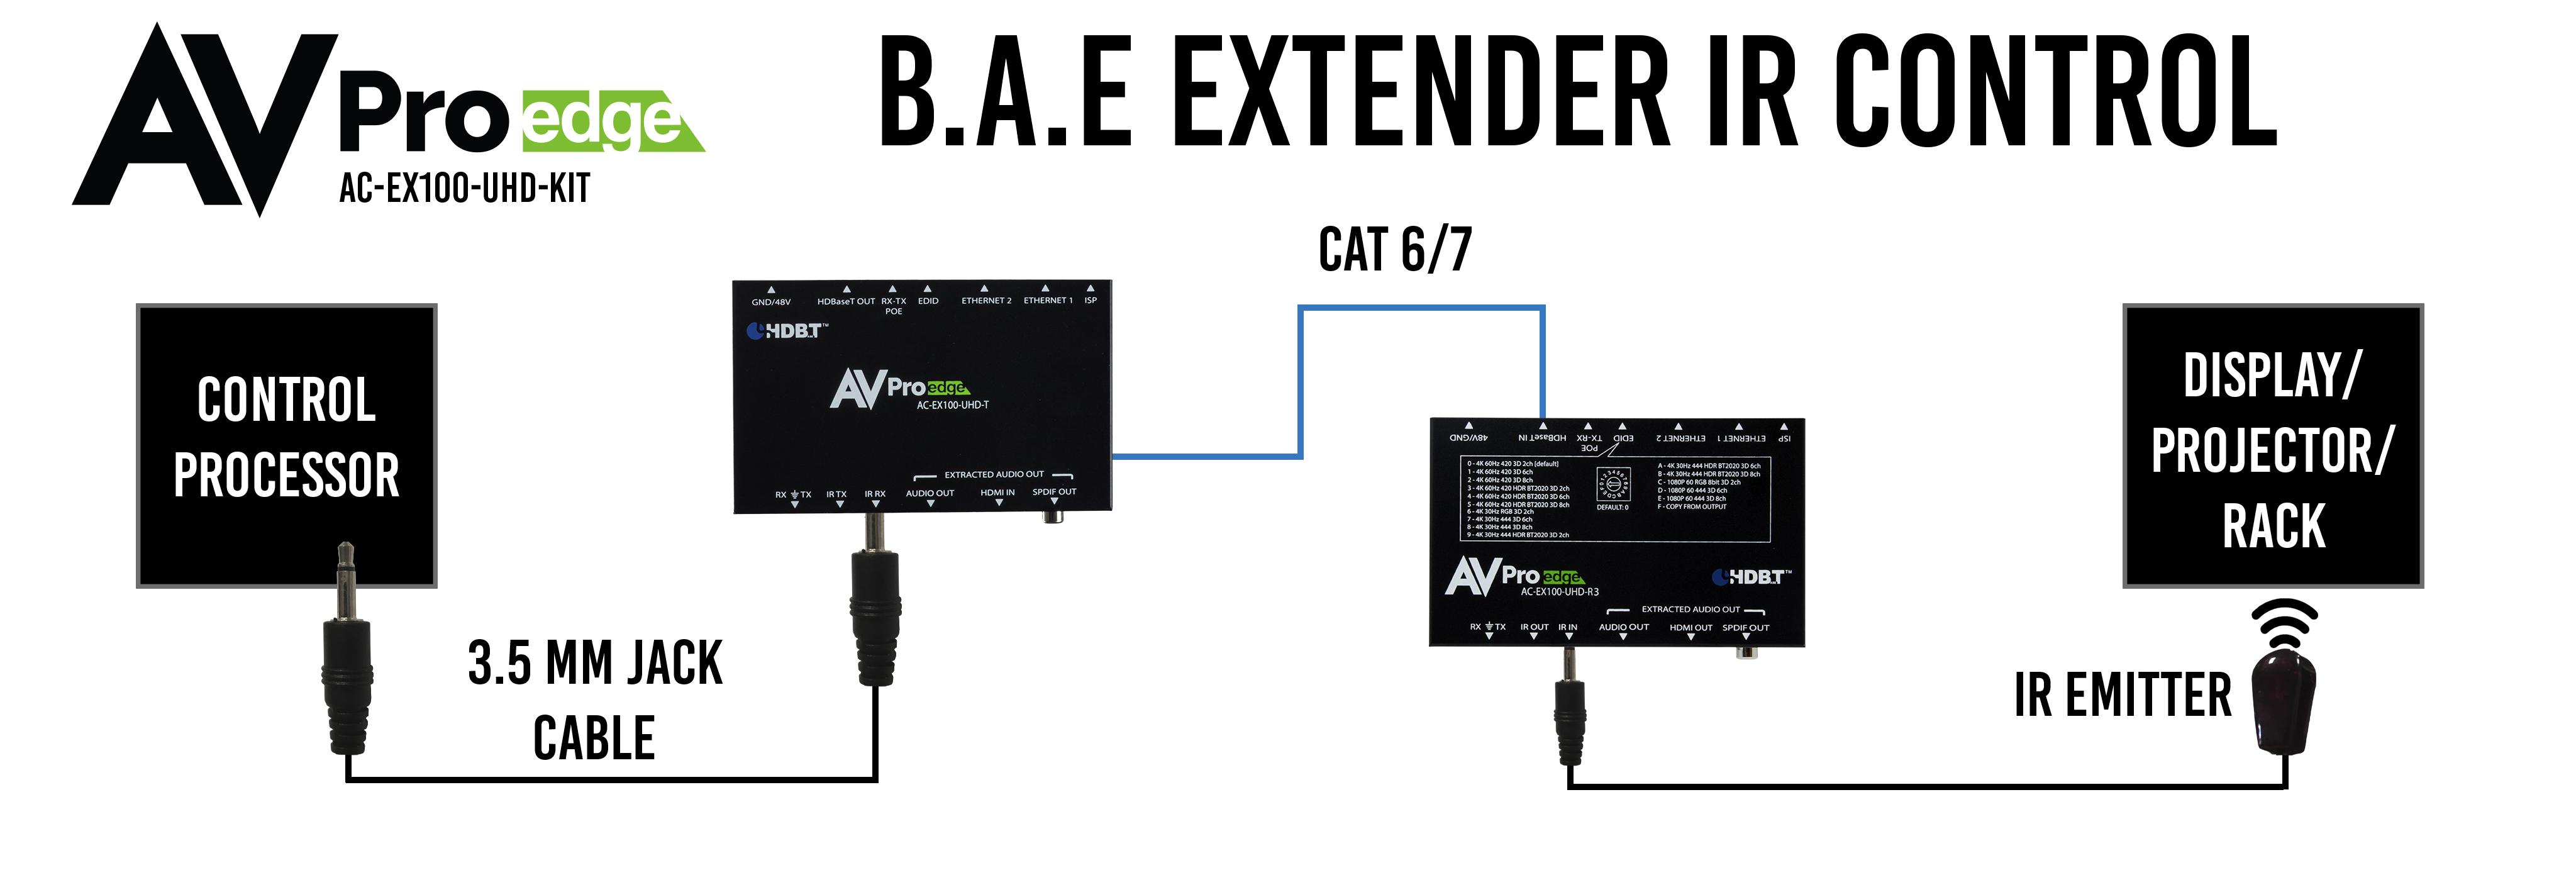 Avpro Edge Bae 100 Meter Hdmi Extender Via Hdbaset 4k 20 Ir Repeaters Transmitter Circuit Schematic Diagrams